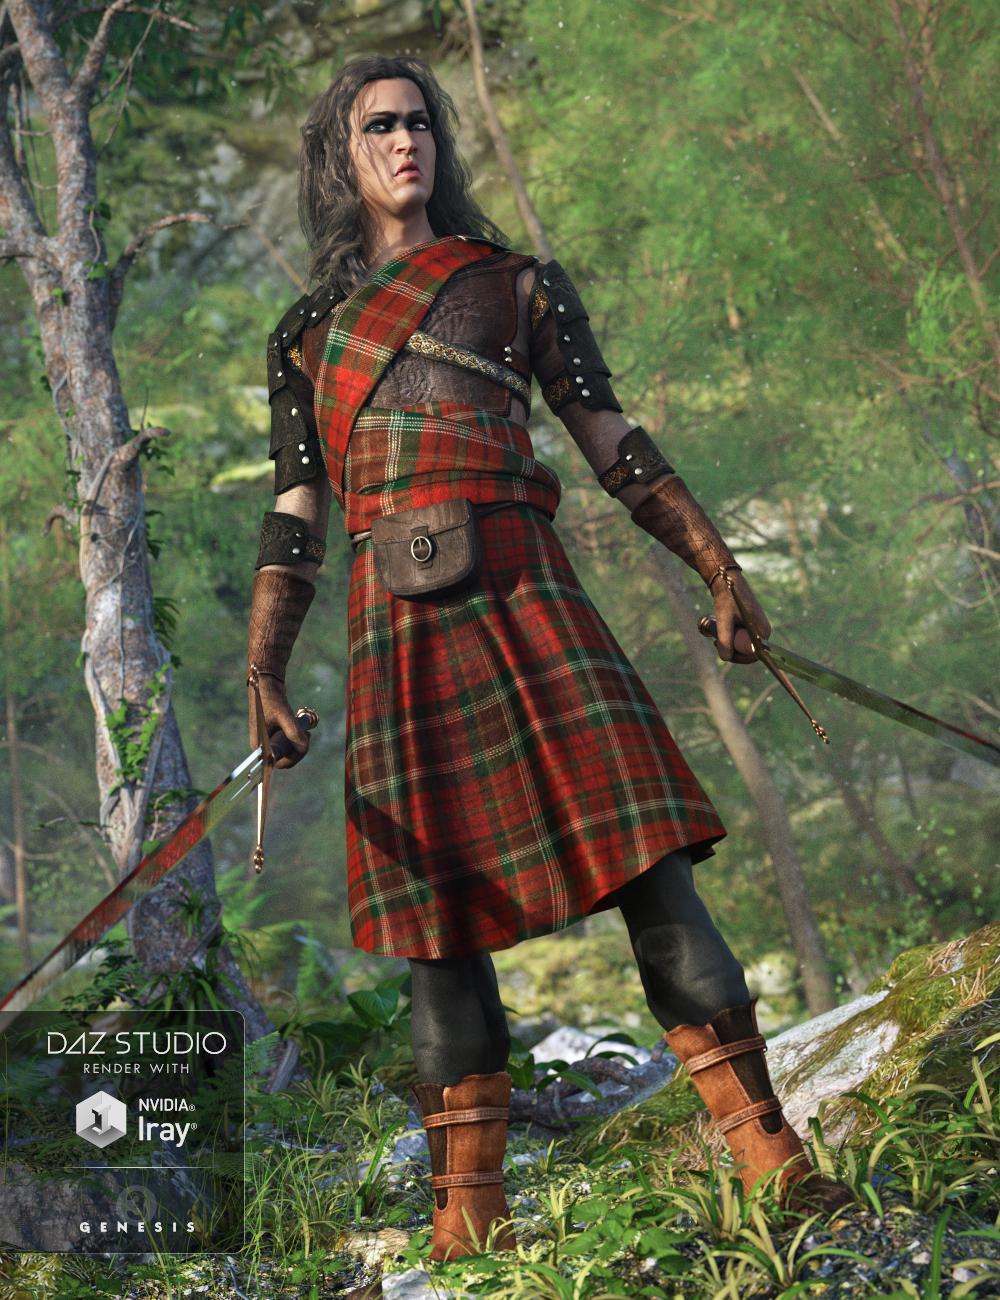 Highlander Outfit for Genesis 3 Male(s) by: Barbara BrundonUmblefugly, 3D Models by Daz 3D